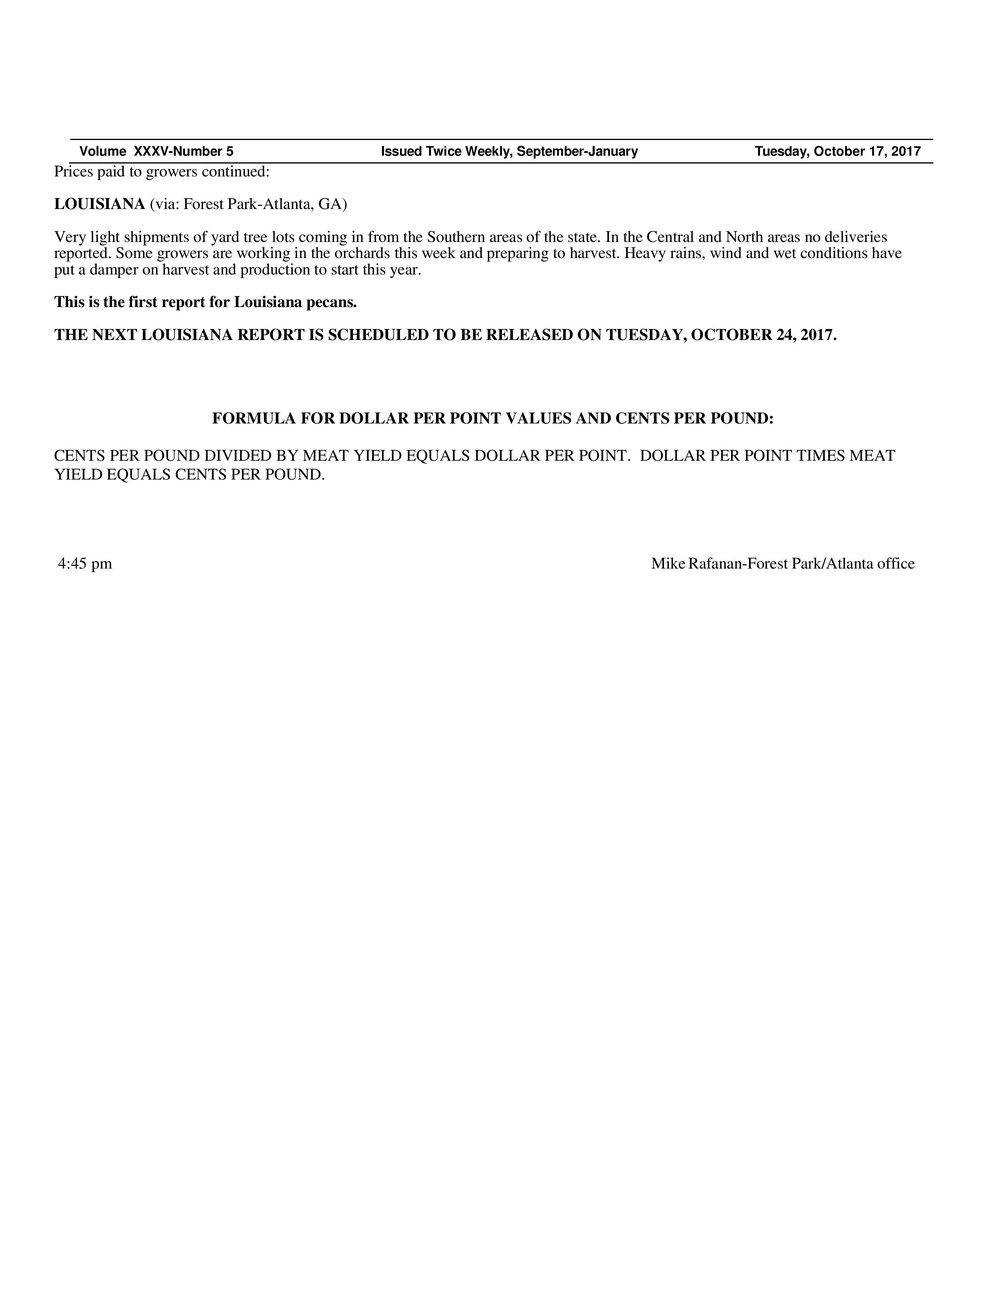 pecan report 10-17-17-page-002.jpg